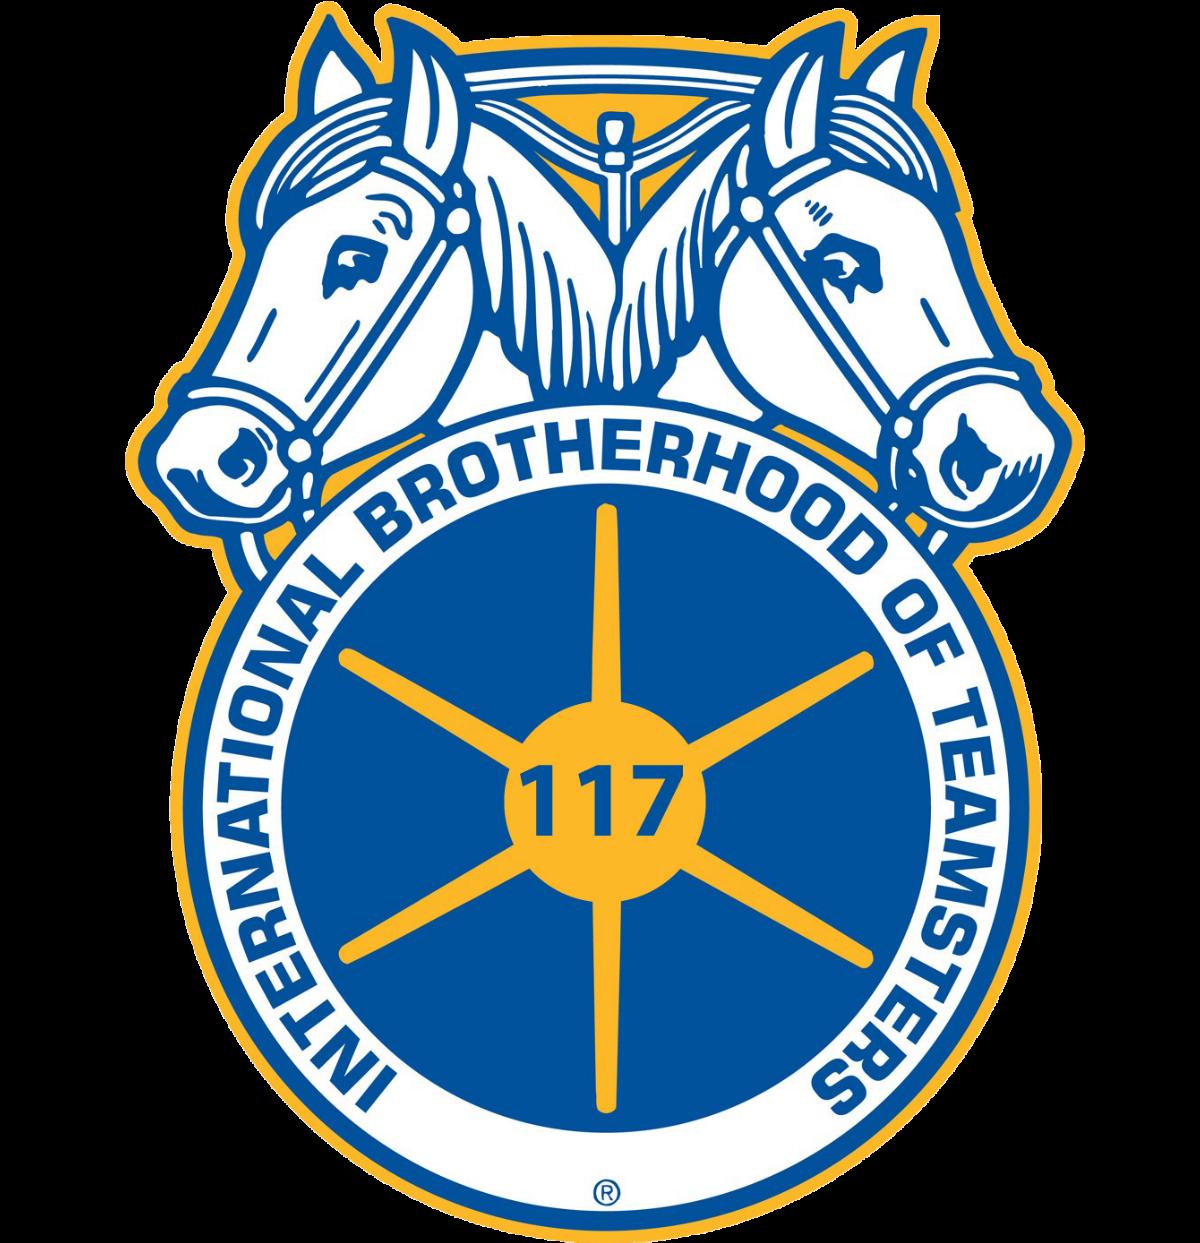 International Brotherhood of Teamsters Local 117